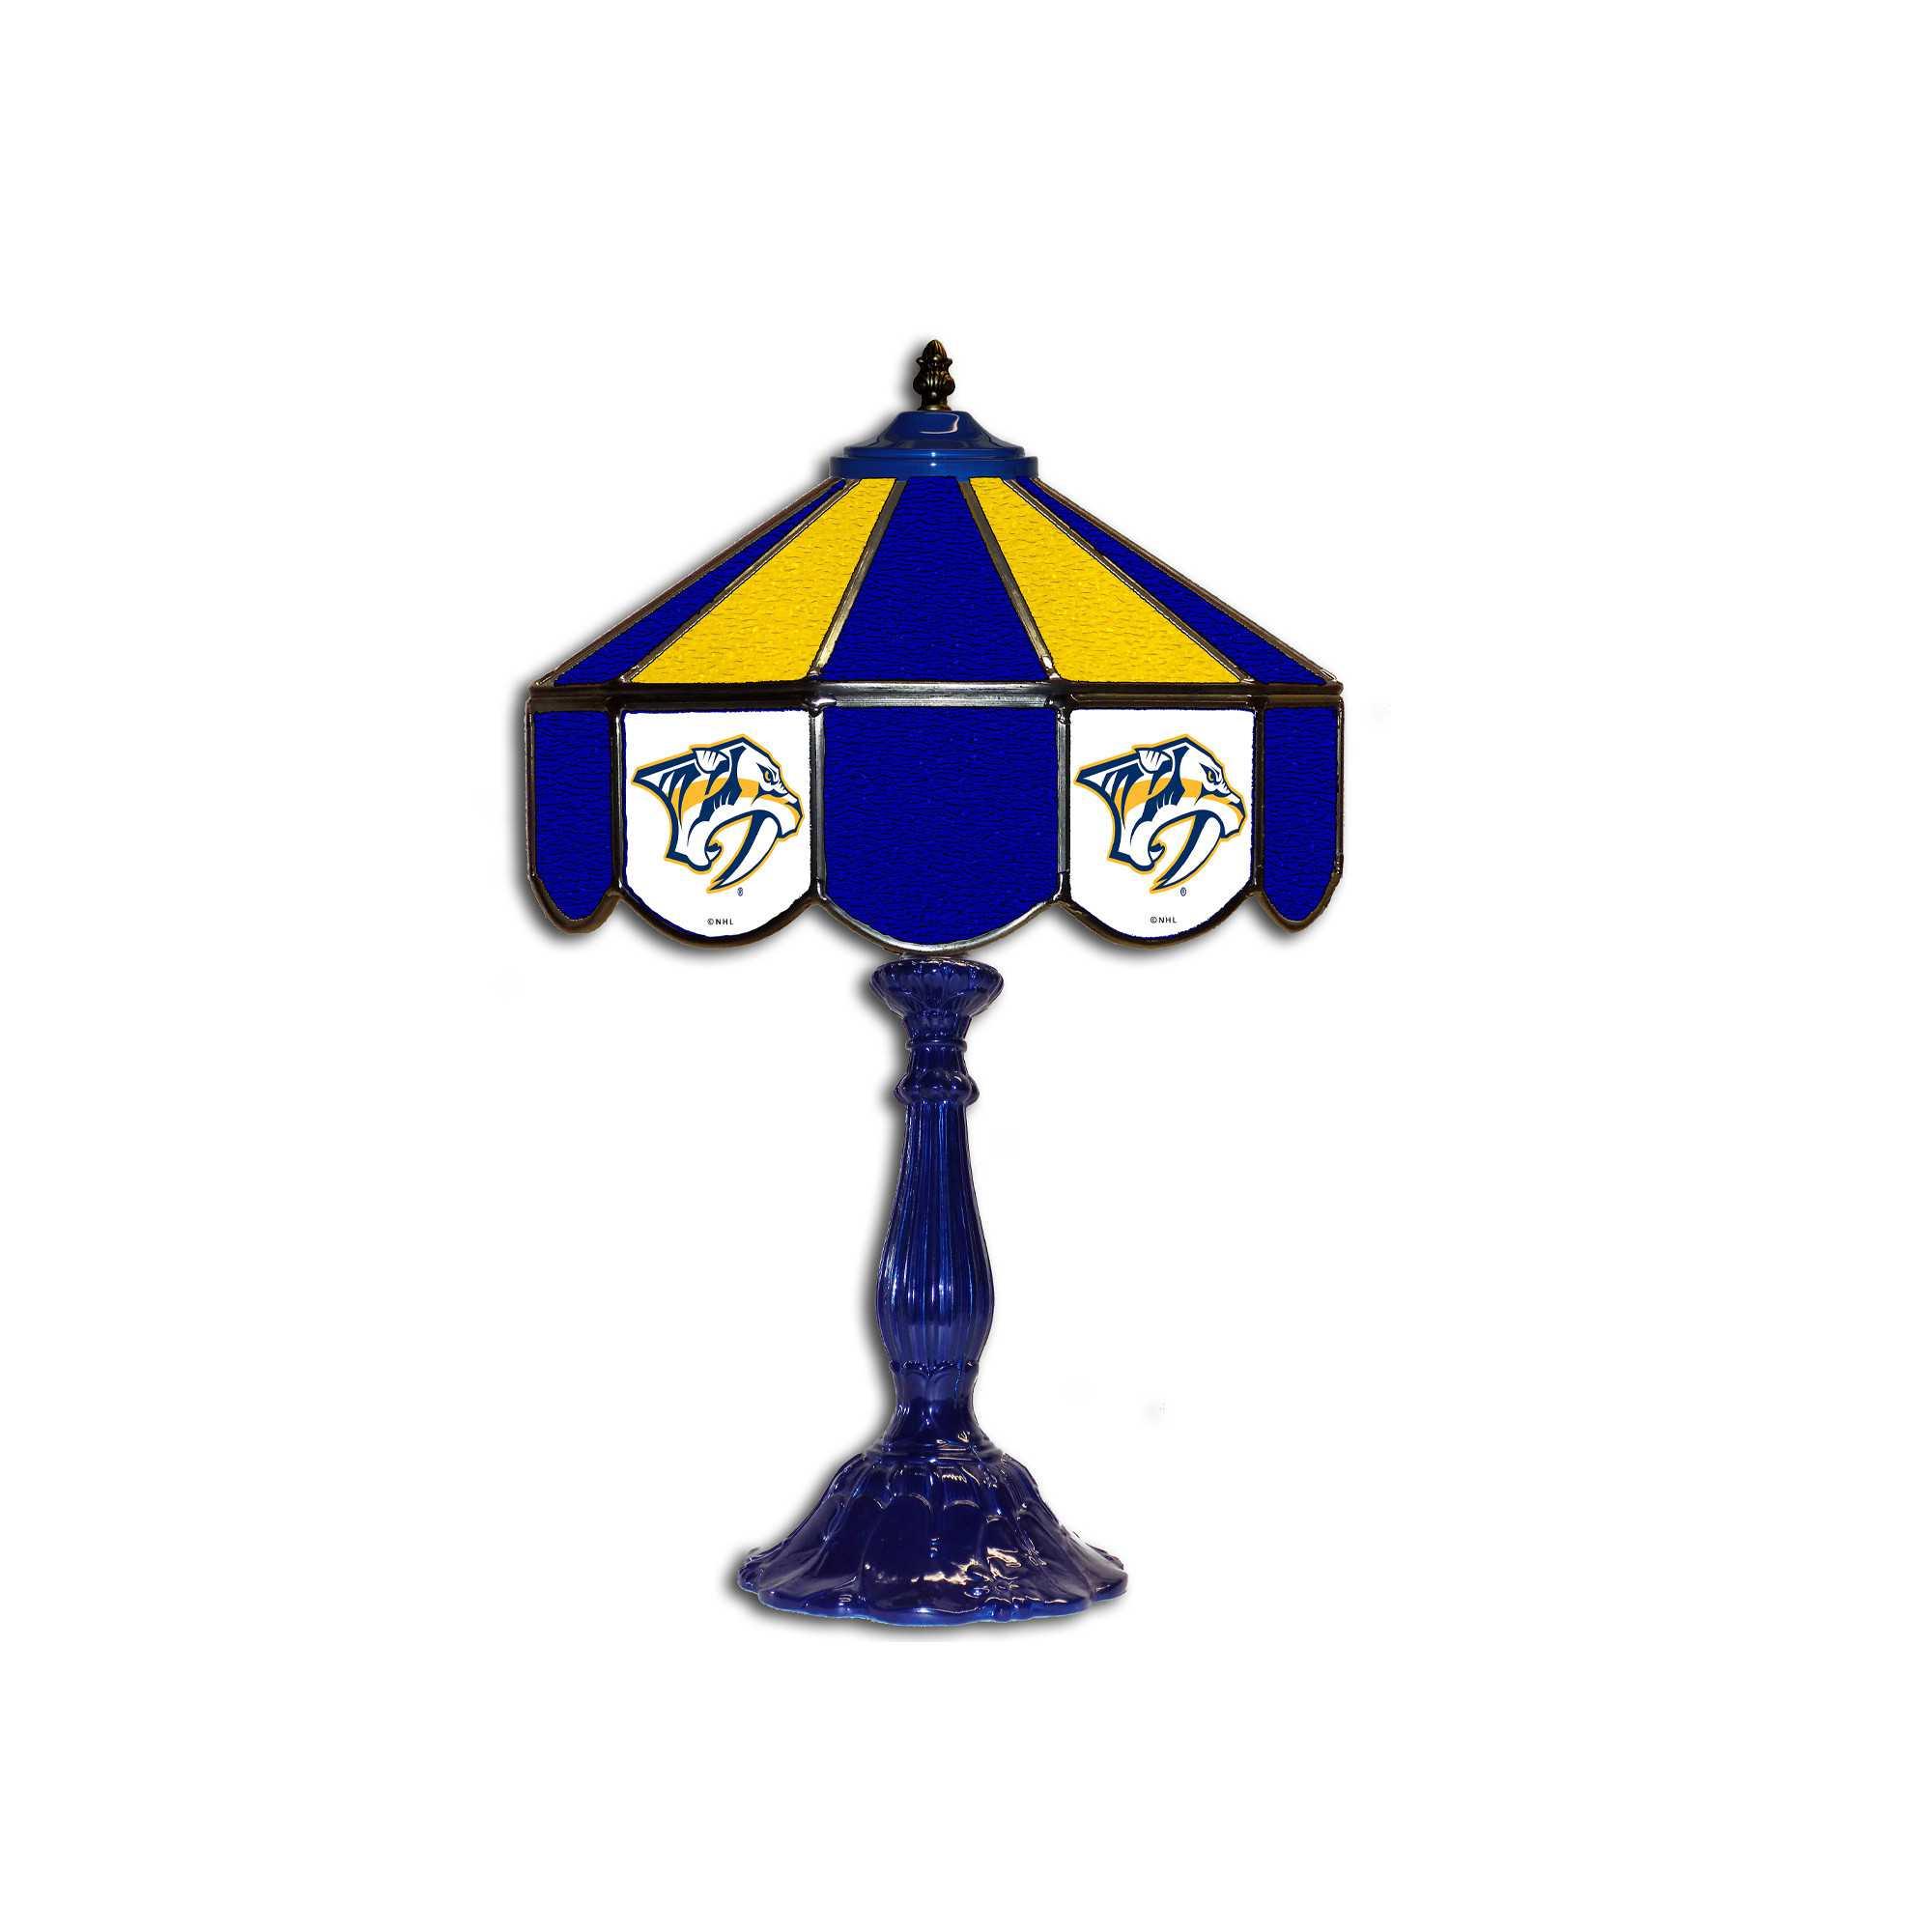 "NASHVILLE PREDATORS 21"" GLASS TABLE LAMP"